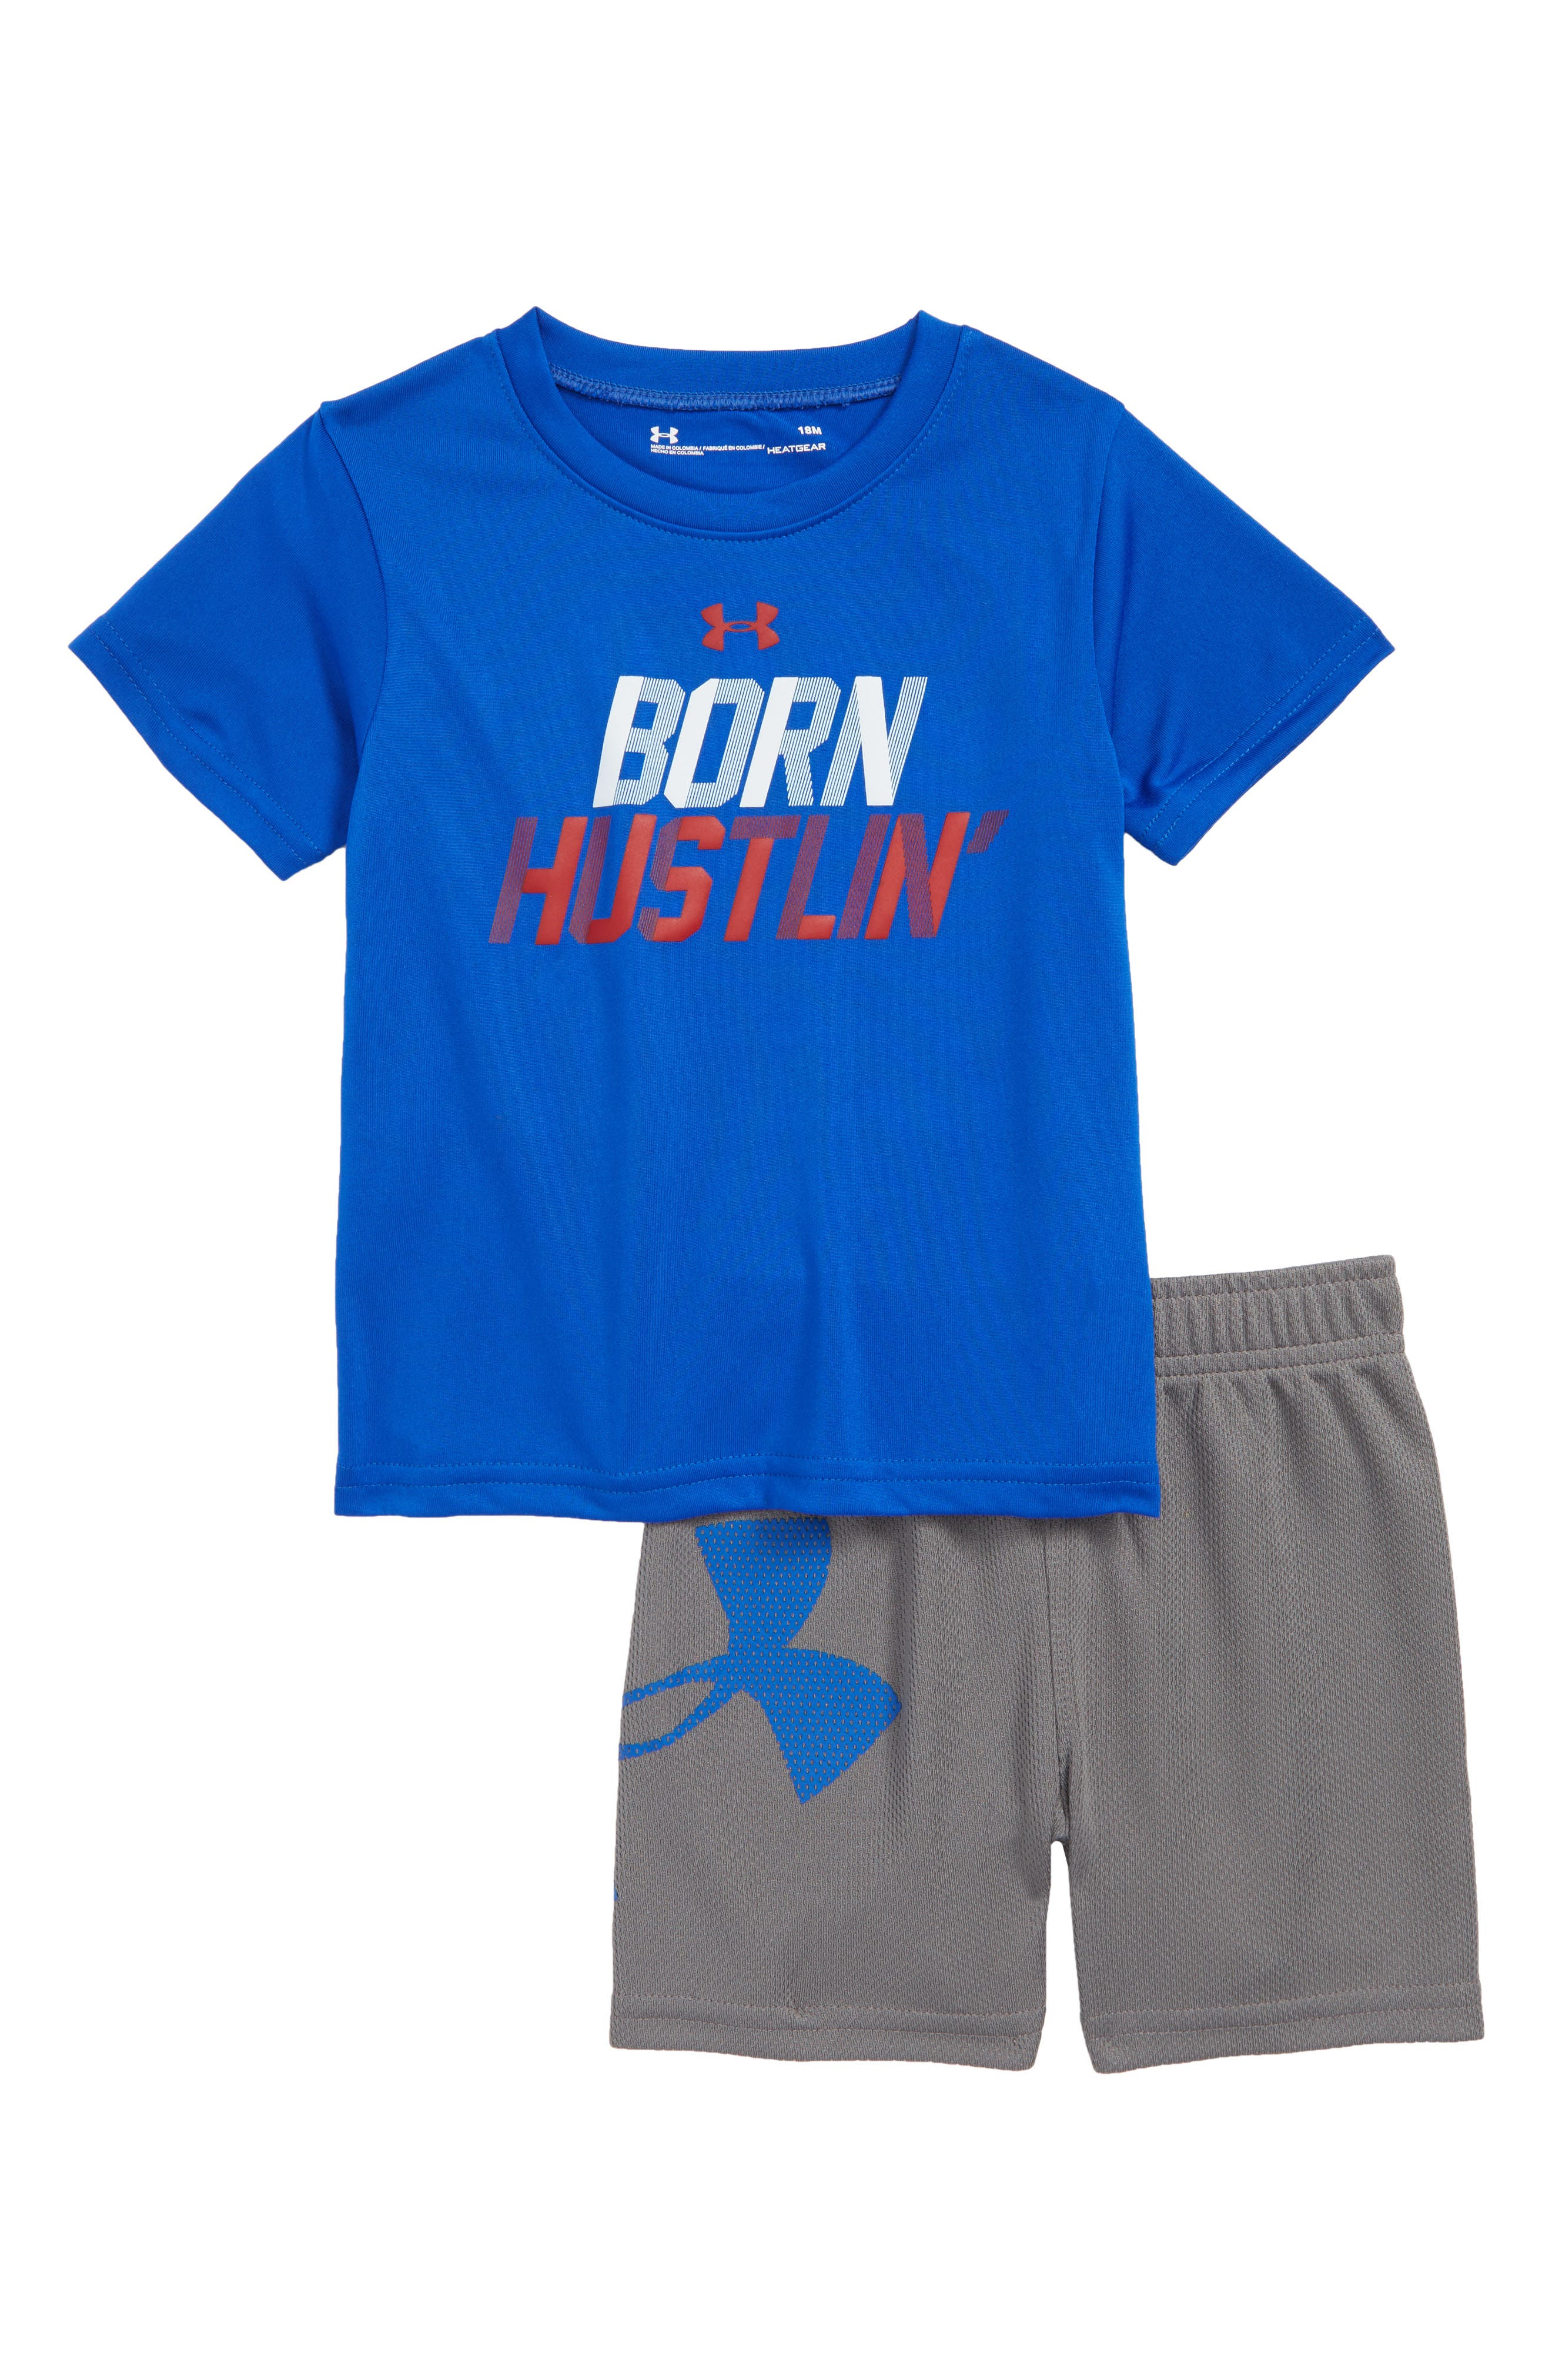 Under Armour Born Hustlin T-Shirt & Shorts (Baby Boys)